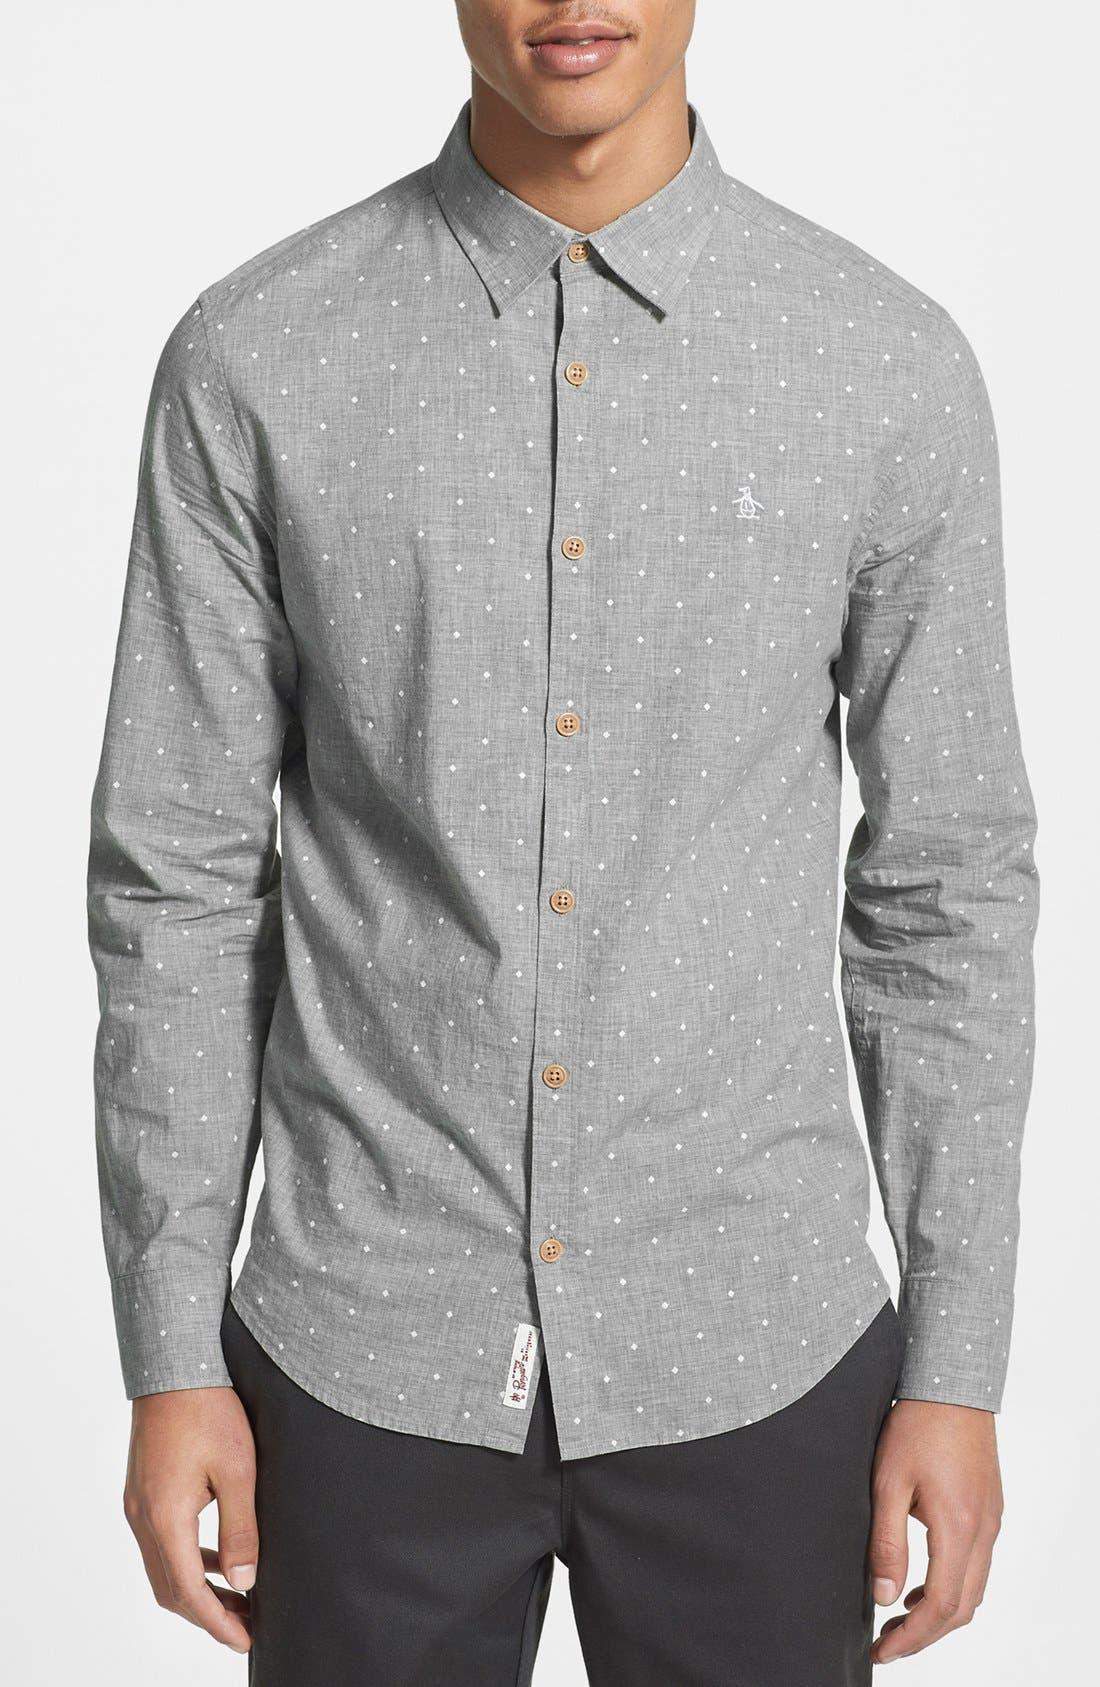 Main Image - Original Penguin Heritage Fit Diamond Dot Print Woven Shirt